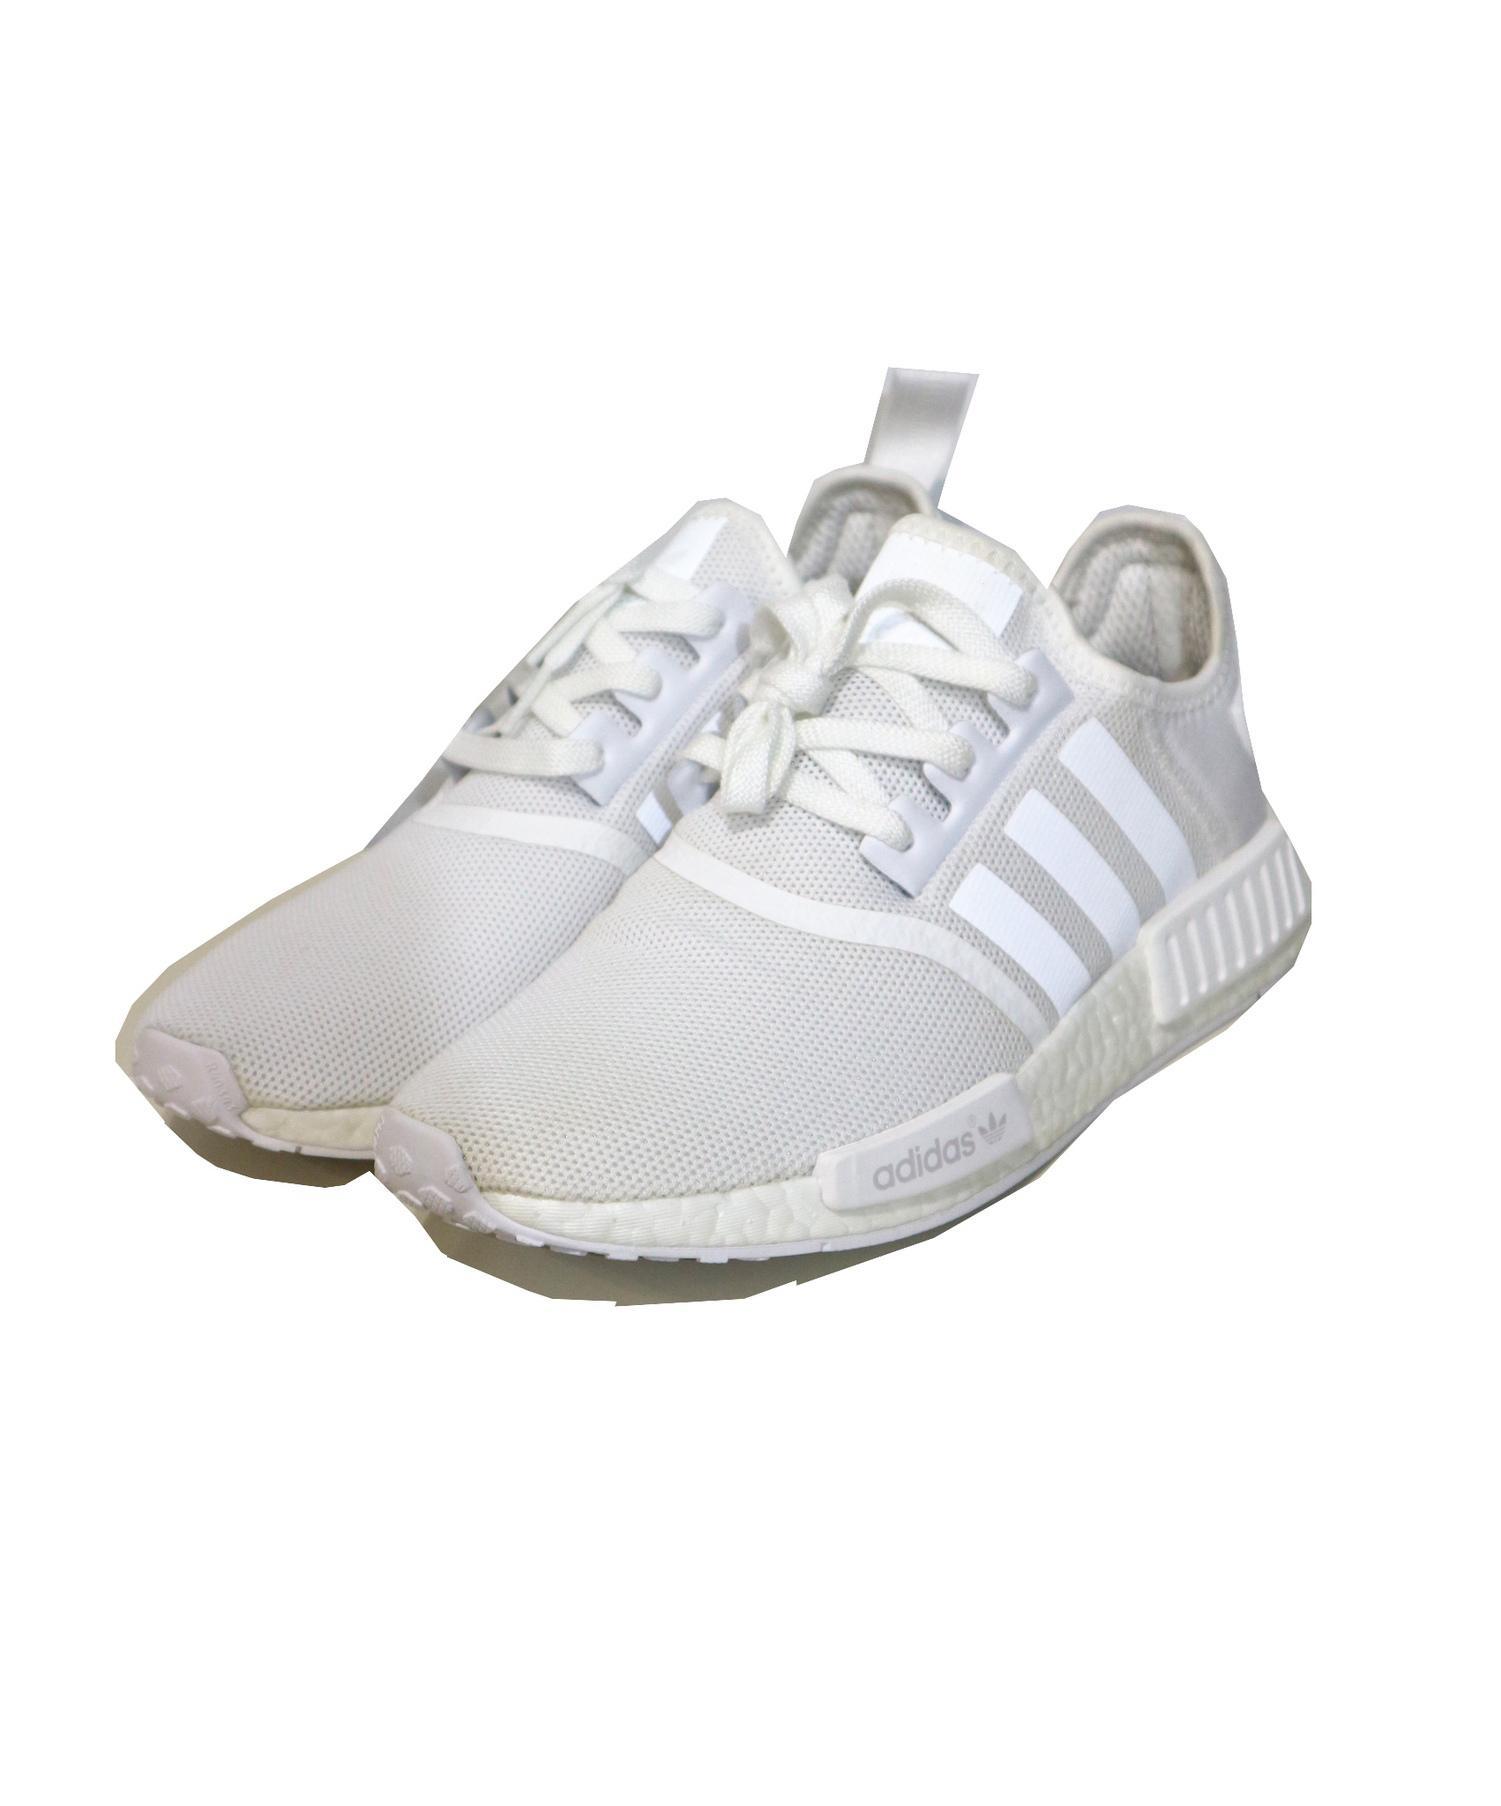 finest selection 7a056 382ee [中古]adidas(アディダス)のメンズ シューズ NMD R1